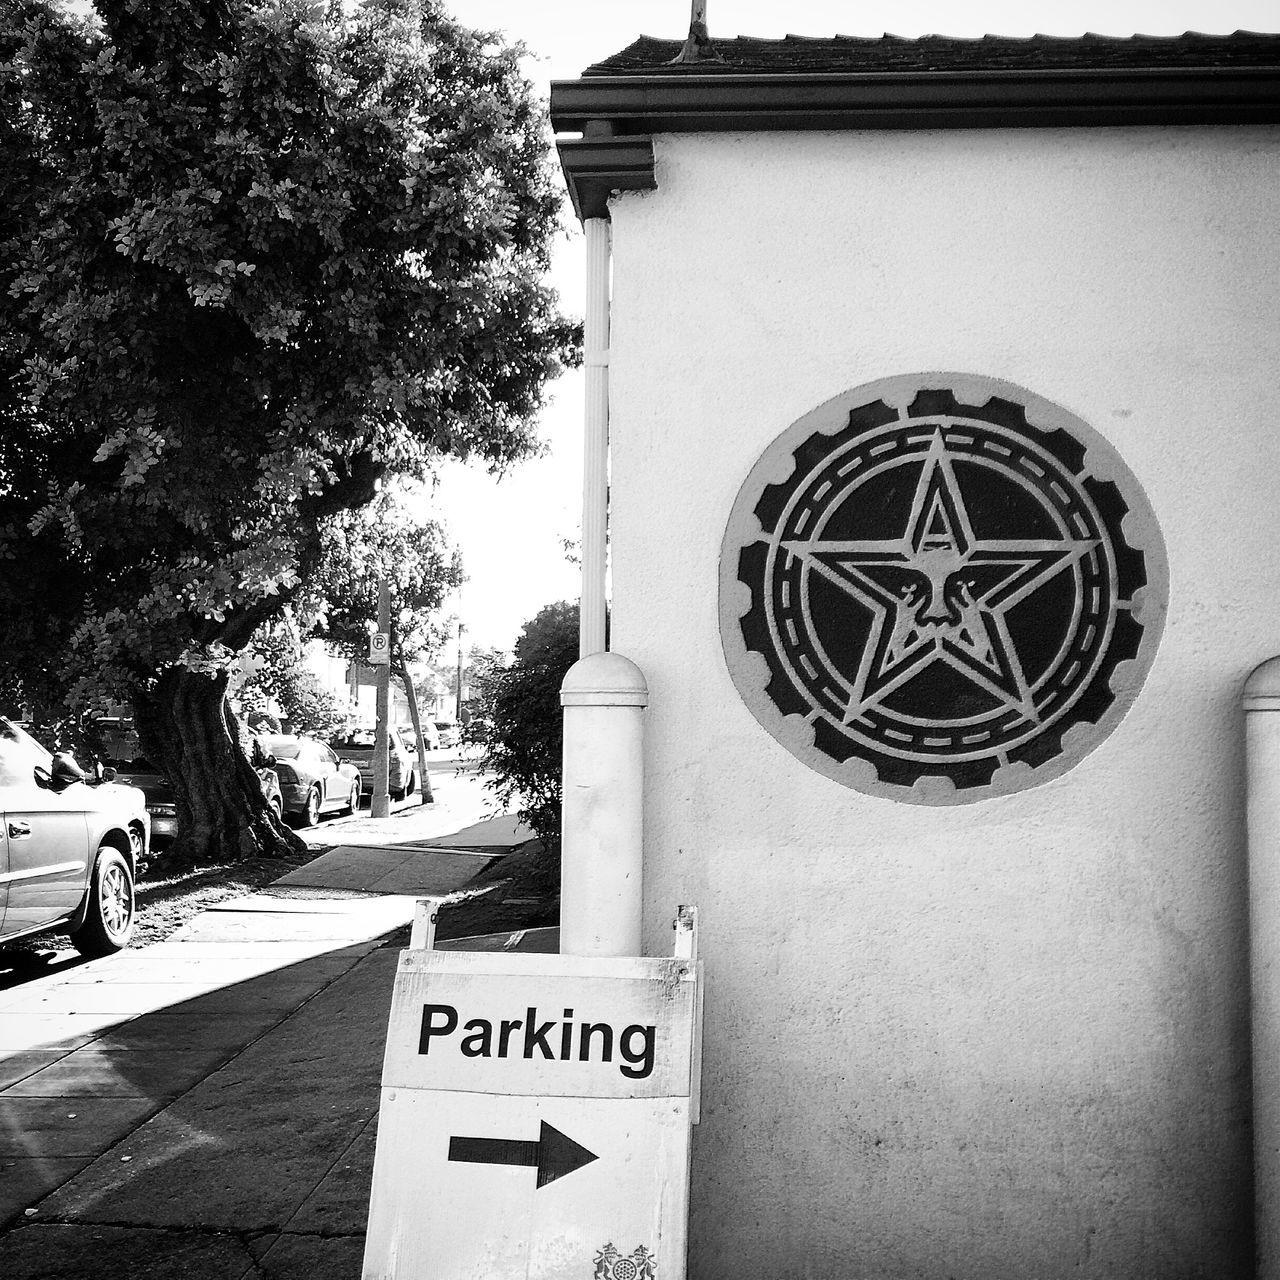 Graffiti Los Angeles, California Mural OBEY Obeygiant Parking Shepard Fairey Street Art